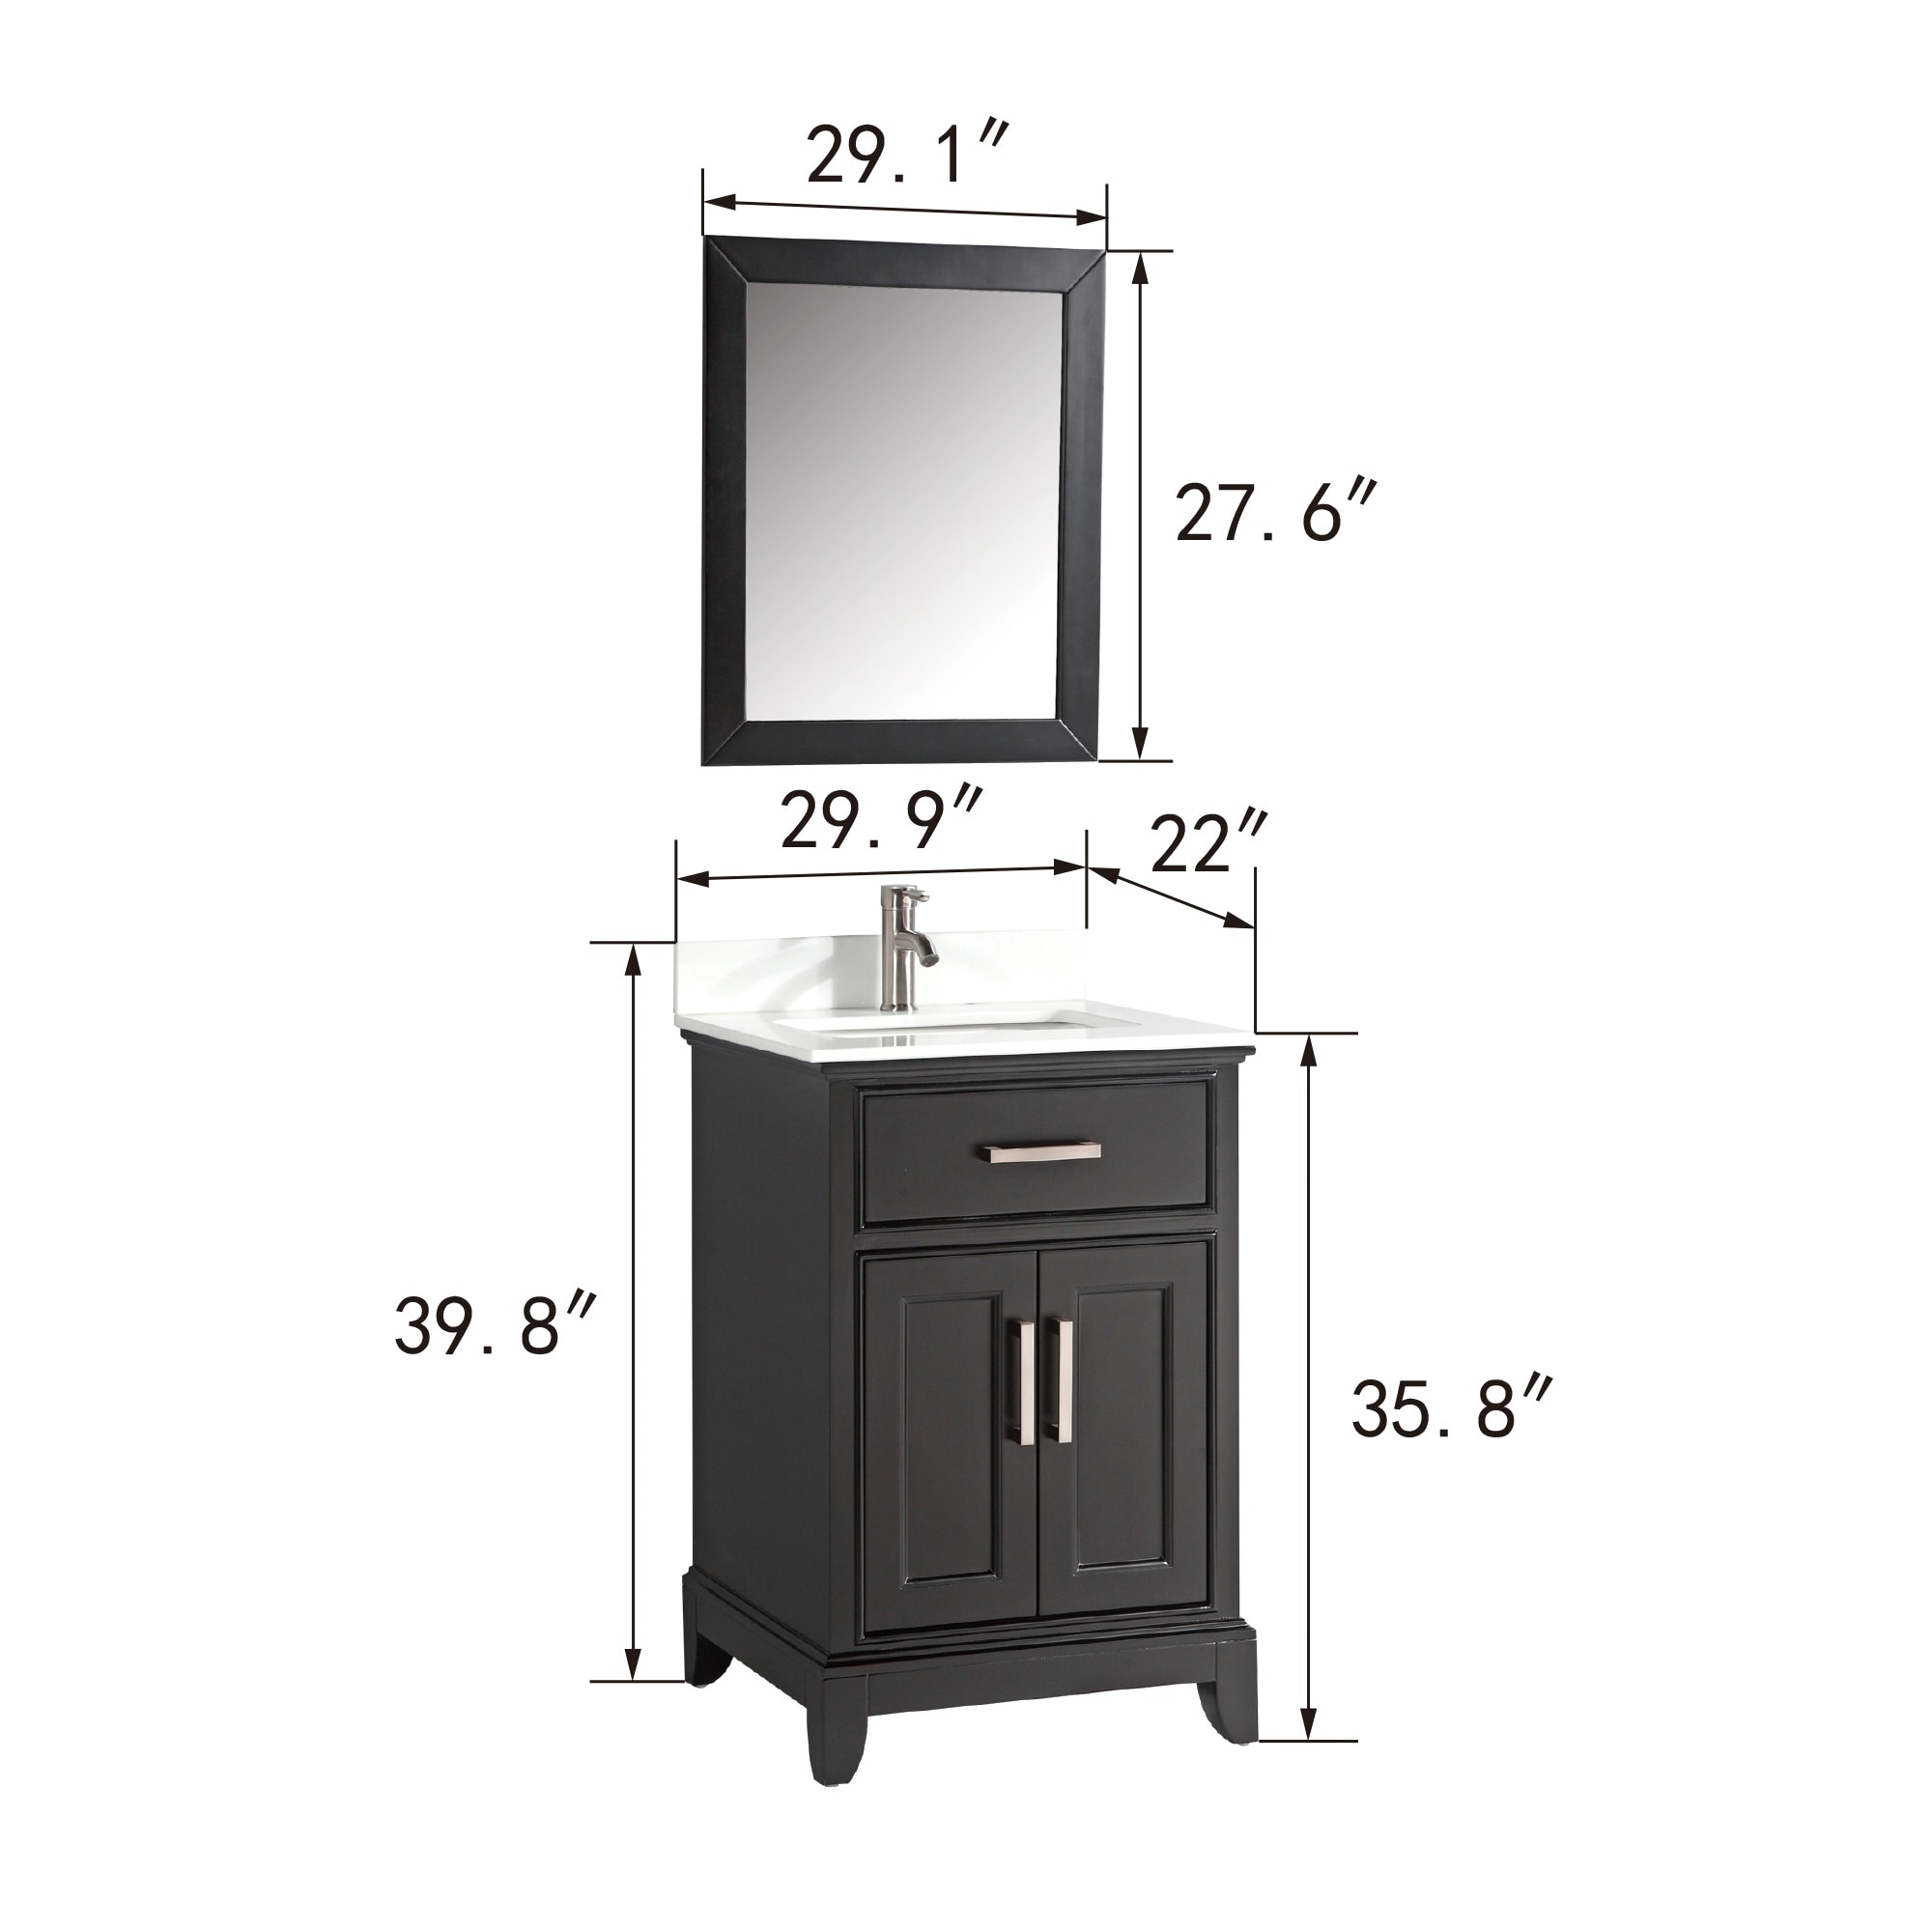 Vanity Art 30 Inch Single Sink Bathroom Vanity Set White Phoenix Stone Top 1 Drawer 1 Shelf Undermount Sink With Free Mirror On Sale Overstock 12364440